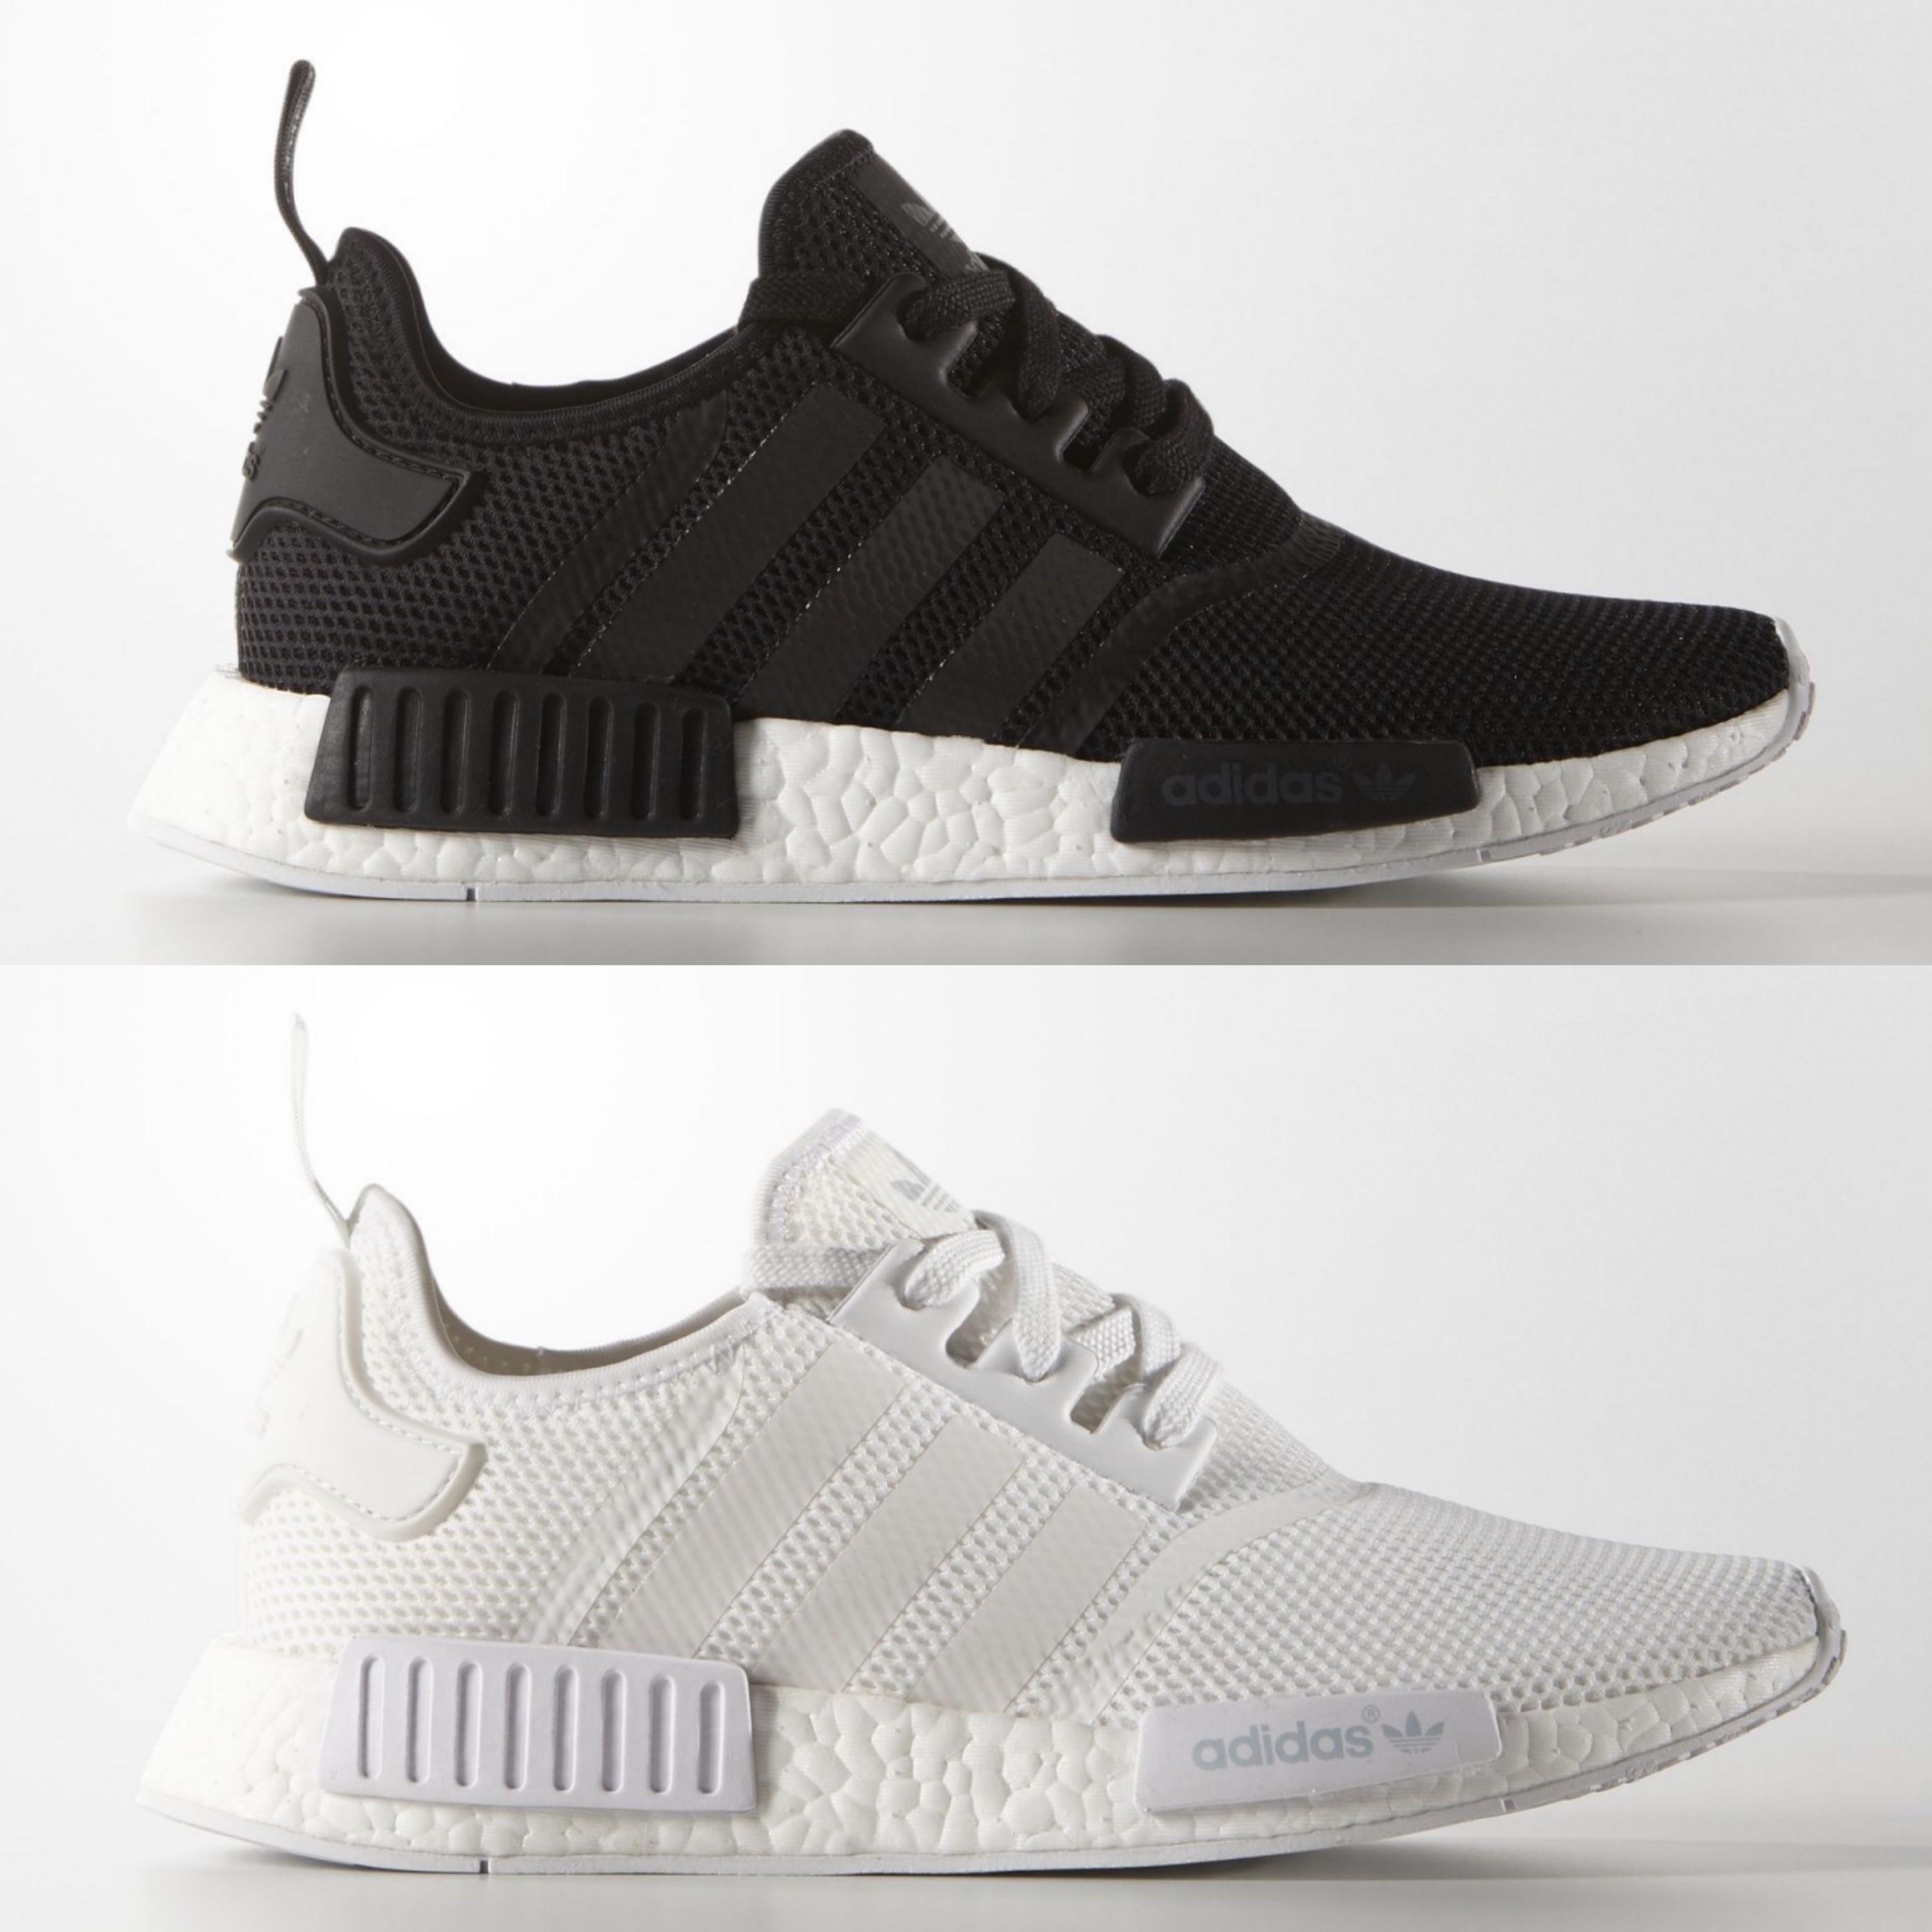 adidas nmd r1 monochrome black white